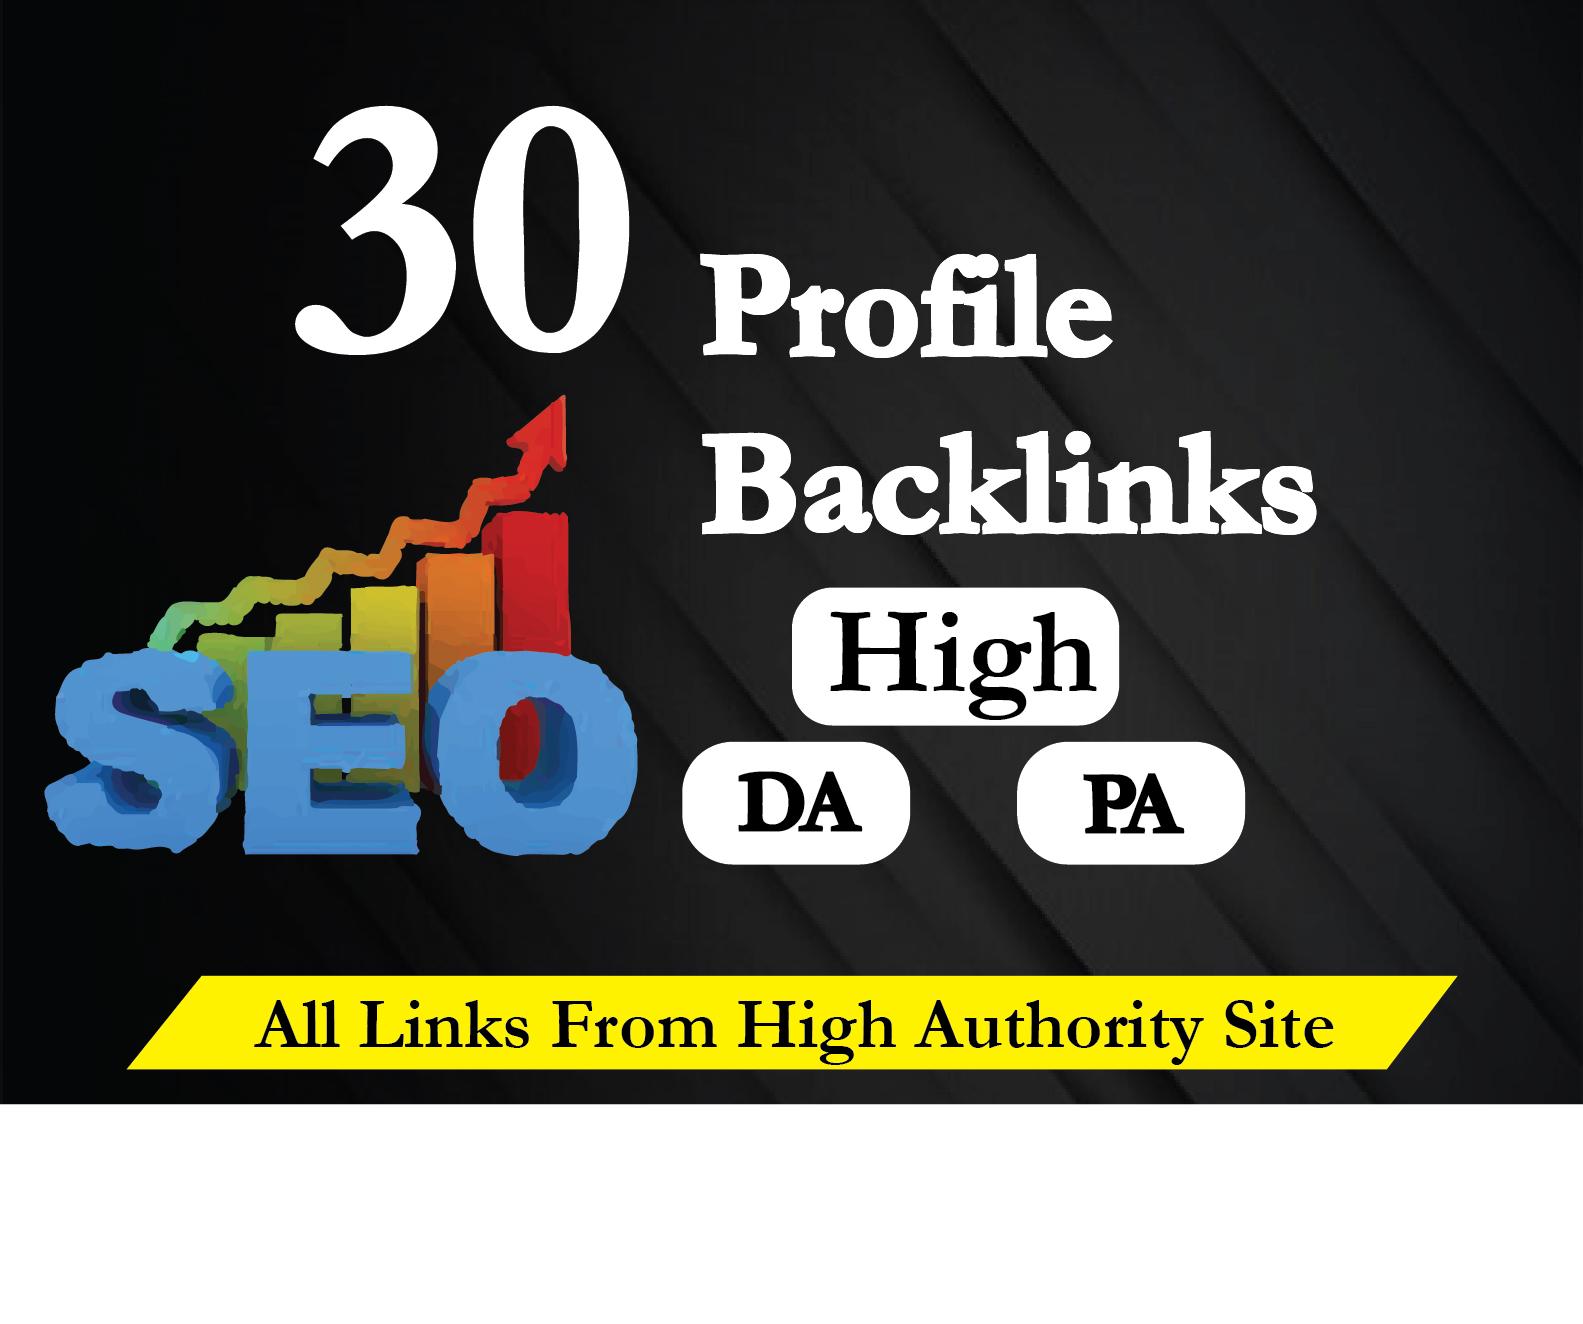 I Will Create 30 High Quality 80 DA SEO Profile Backlinks